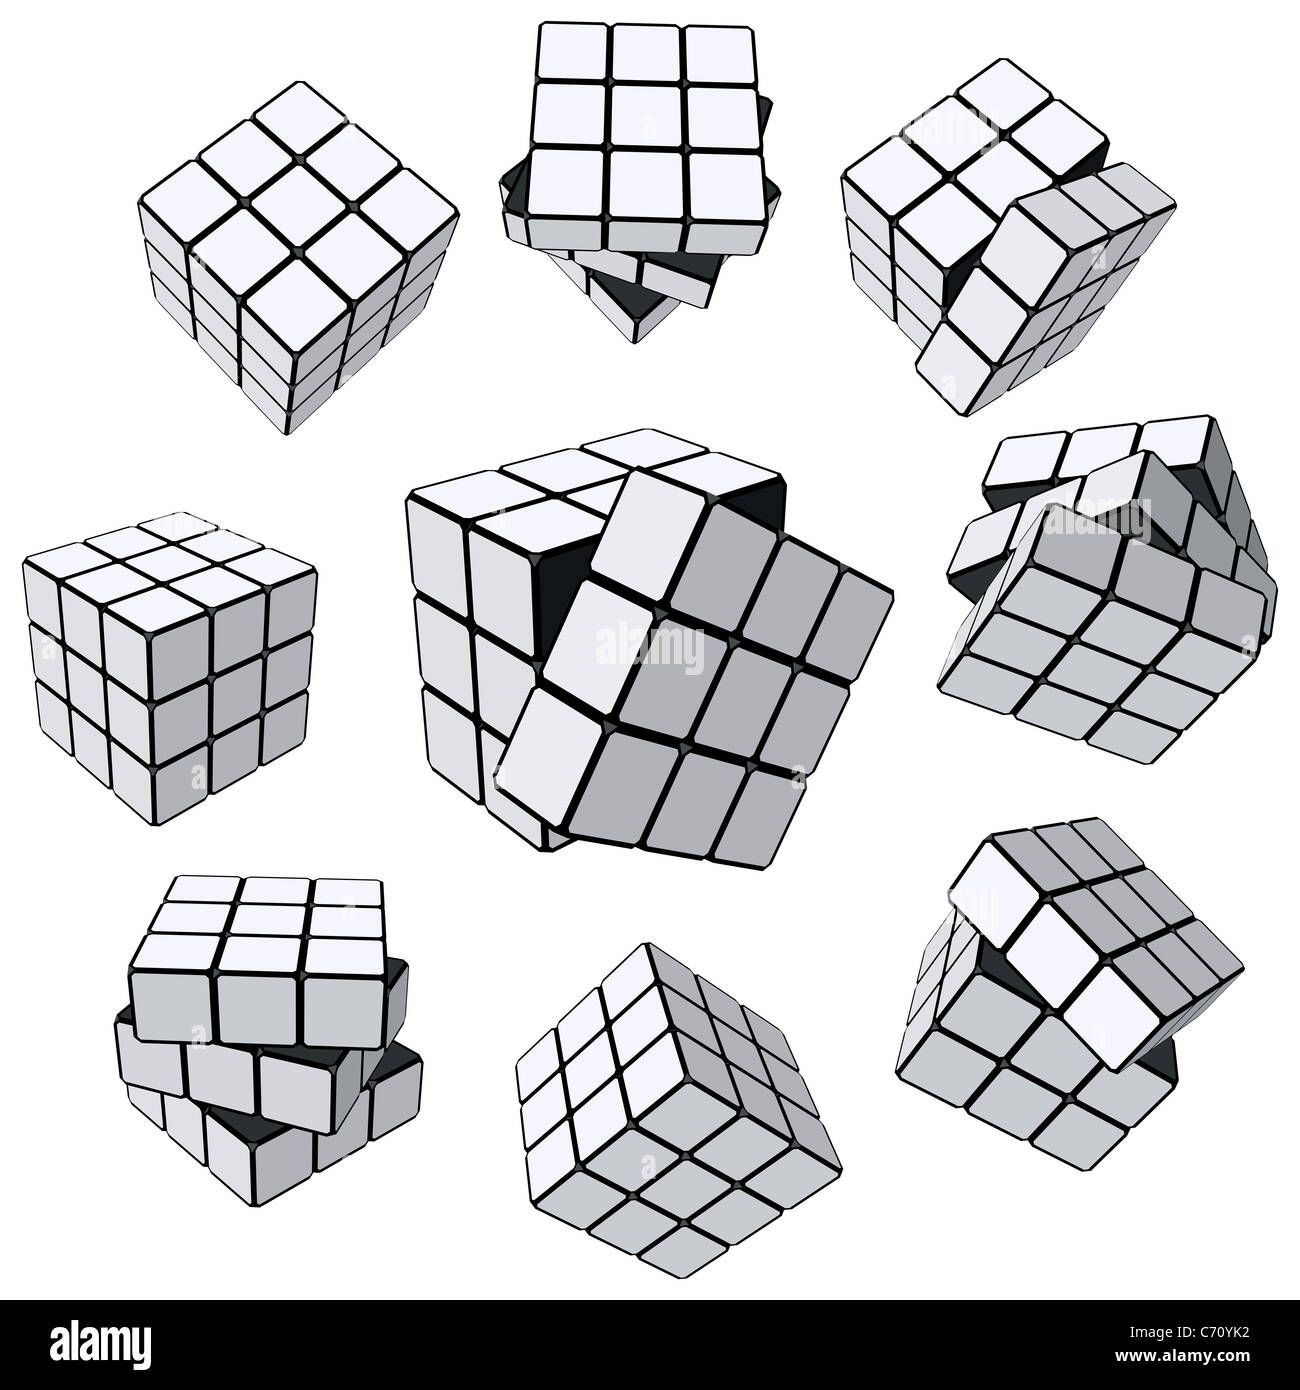 Rubik's Cube puzzle - Stock Image